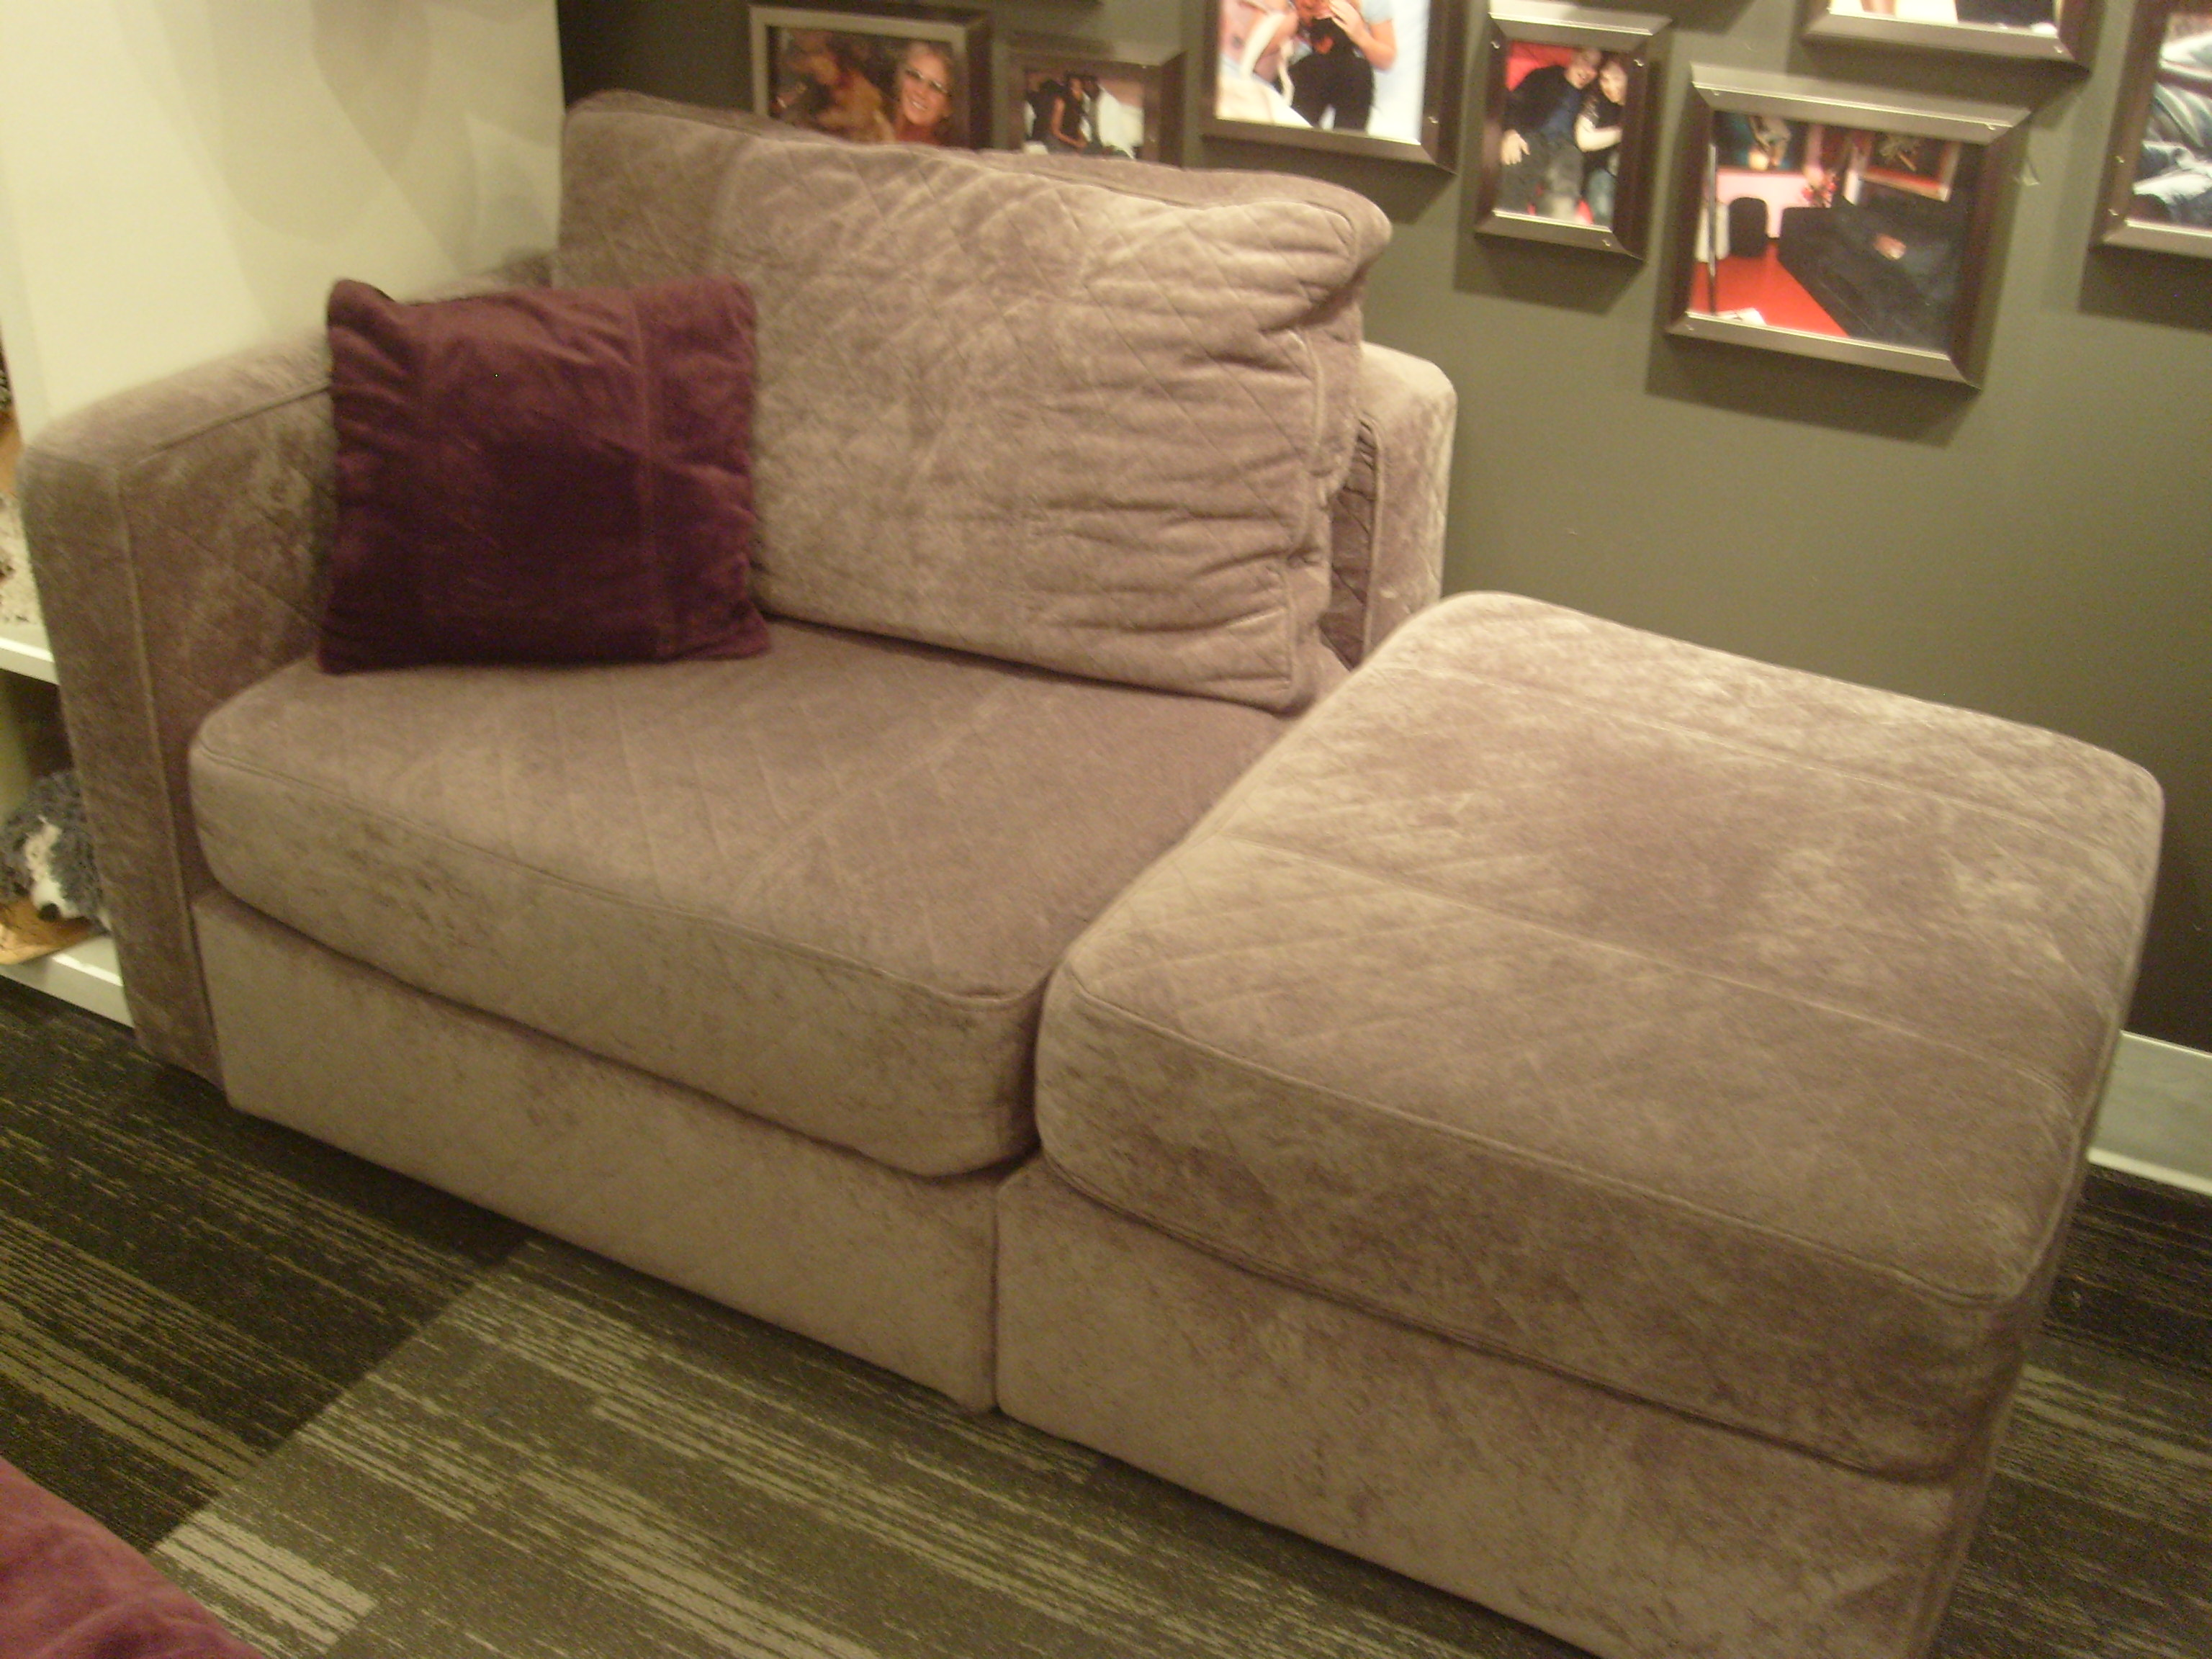 Lovesac Pittsburgh Blog  Lovesac Alternative Furniture  Weve got yinz guyz backs